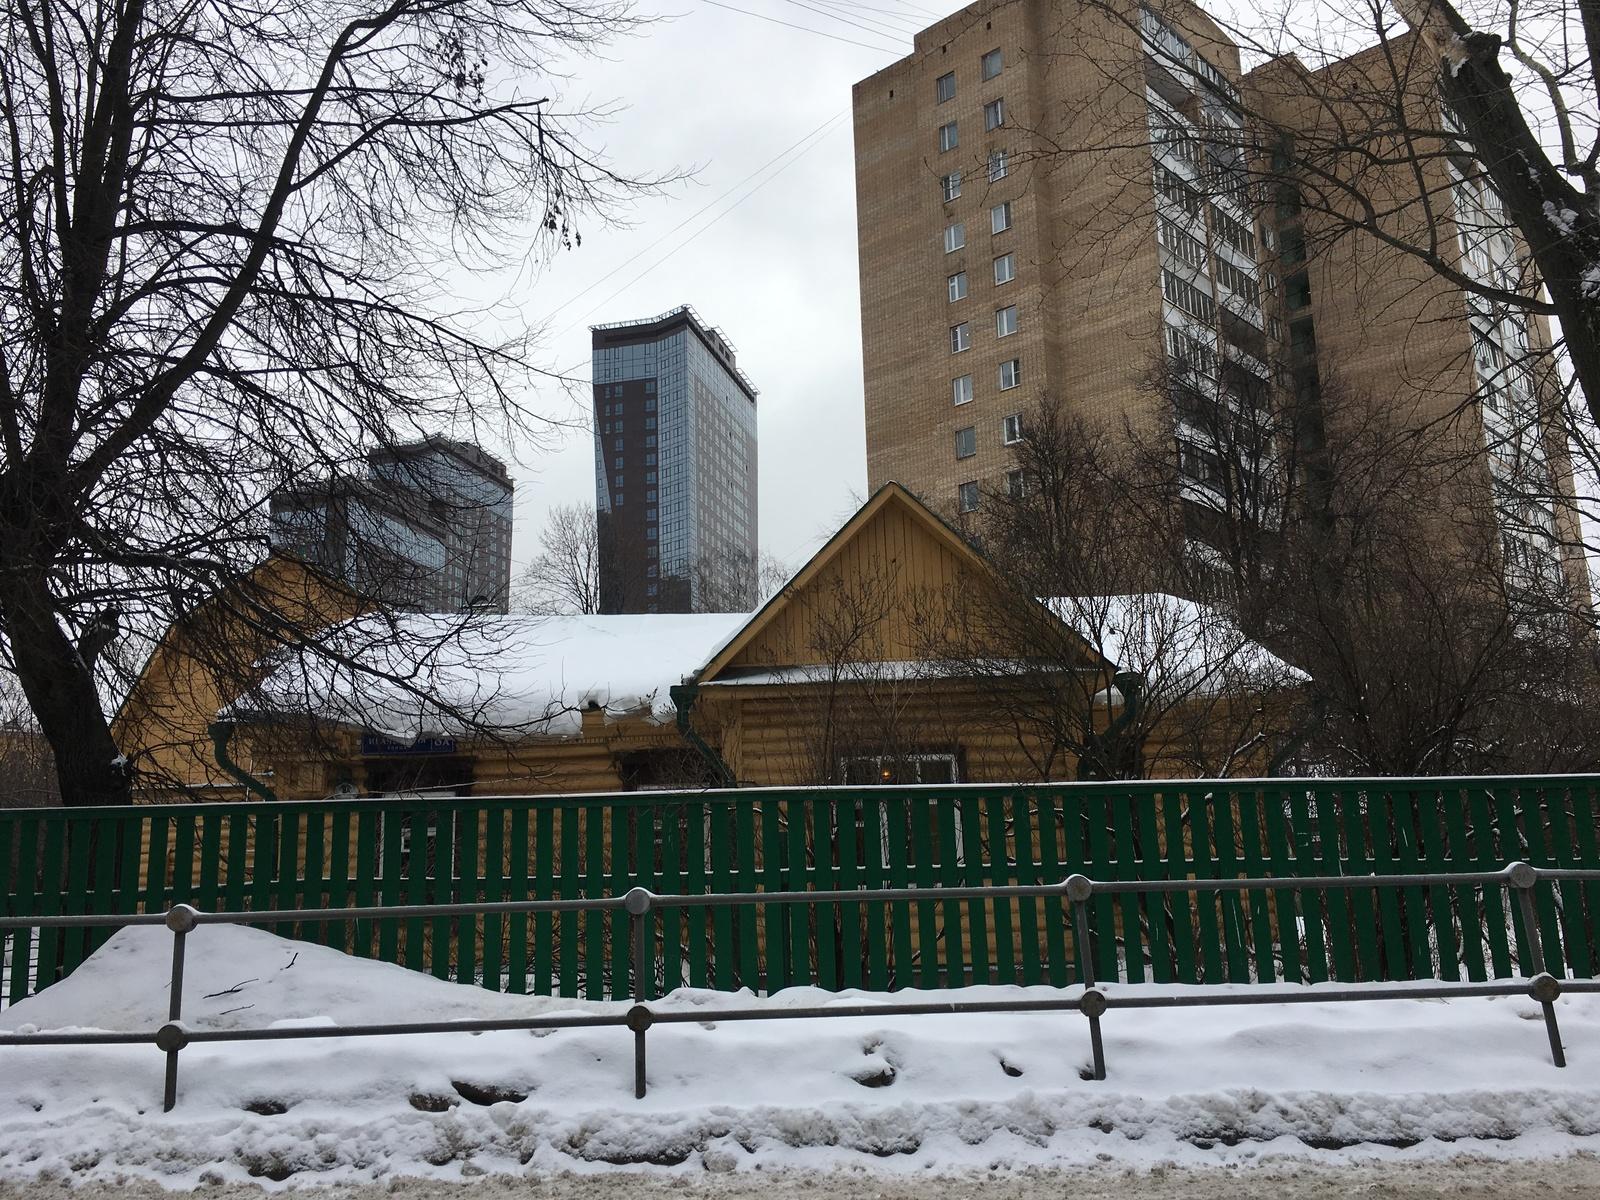 Москва, 2019 год, 11 км от Кремля